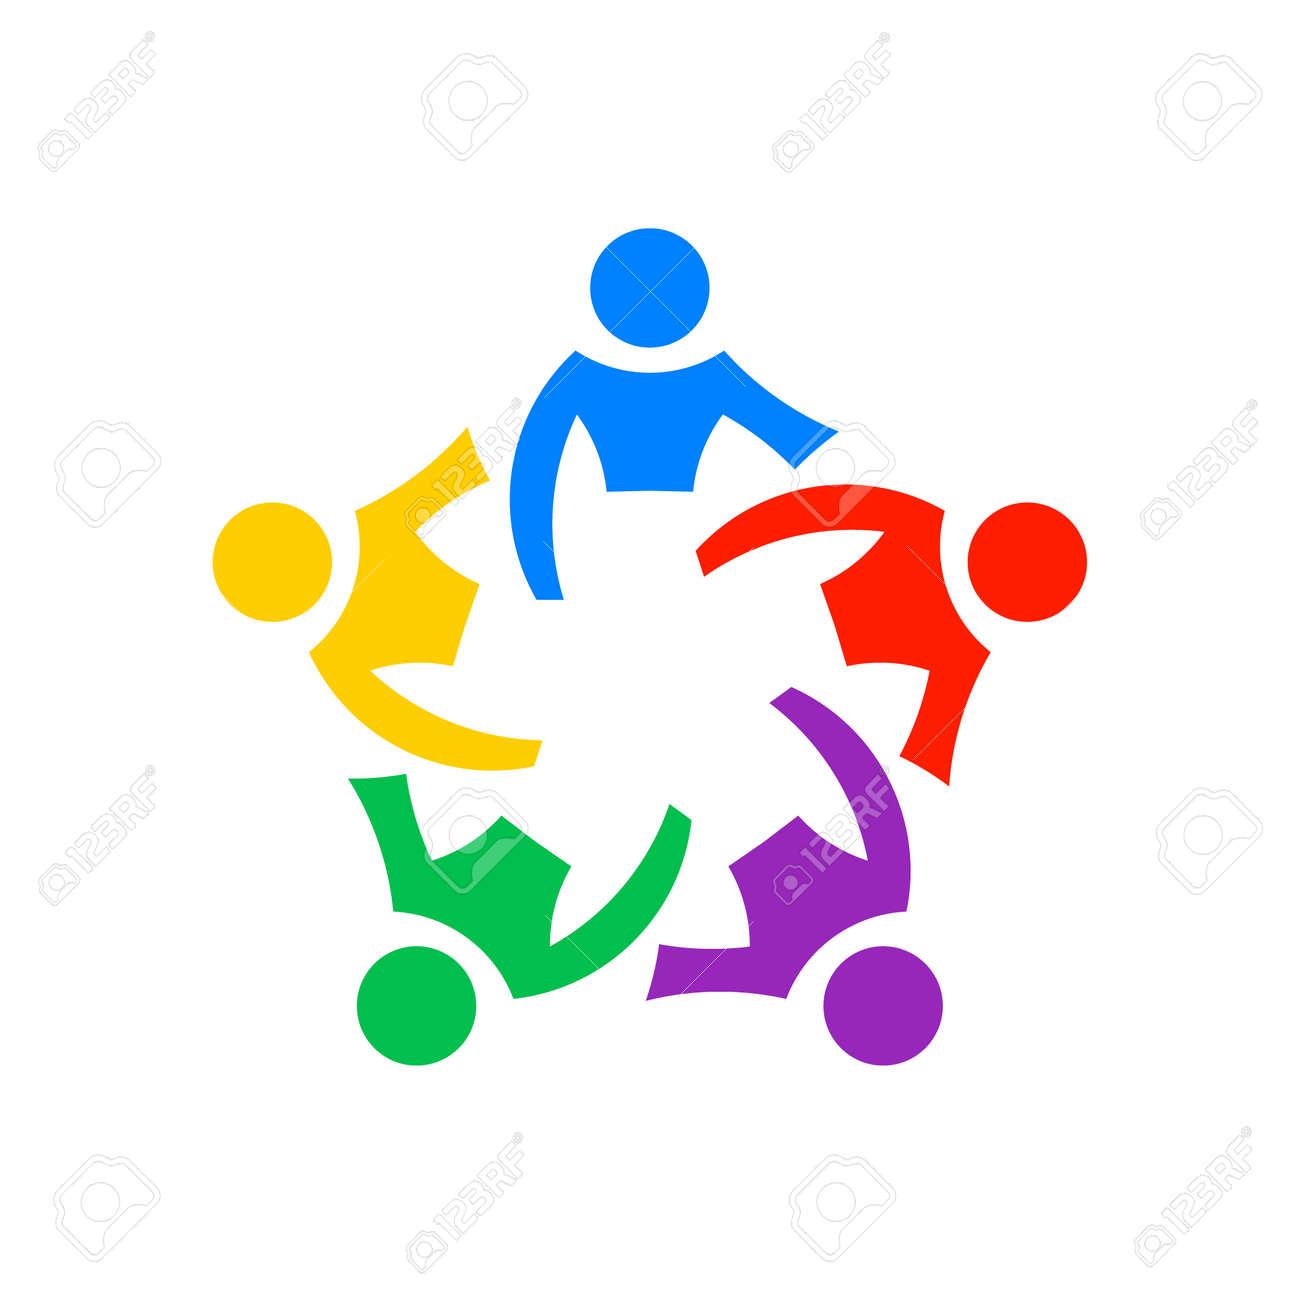 Teamwork people community, vector graphic - 157843927